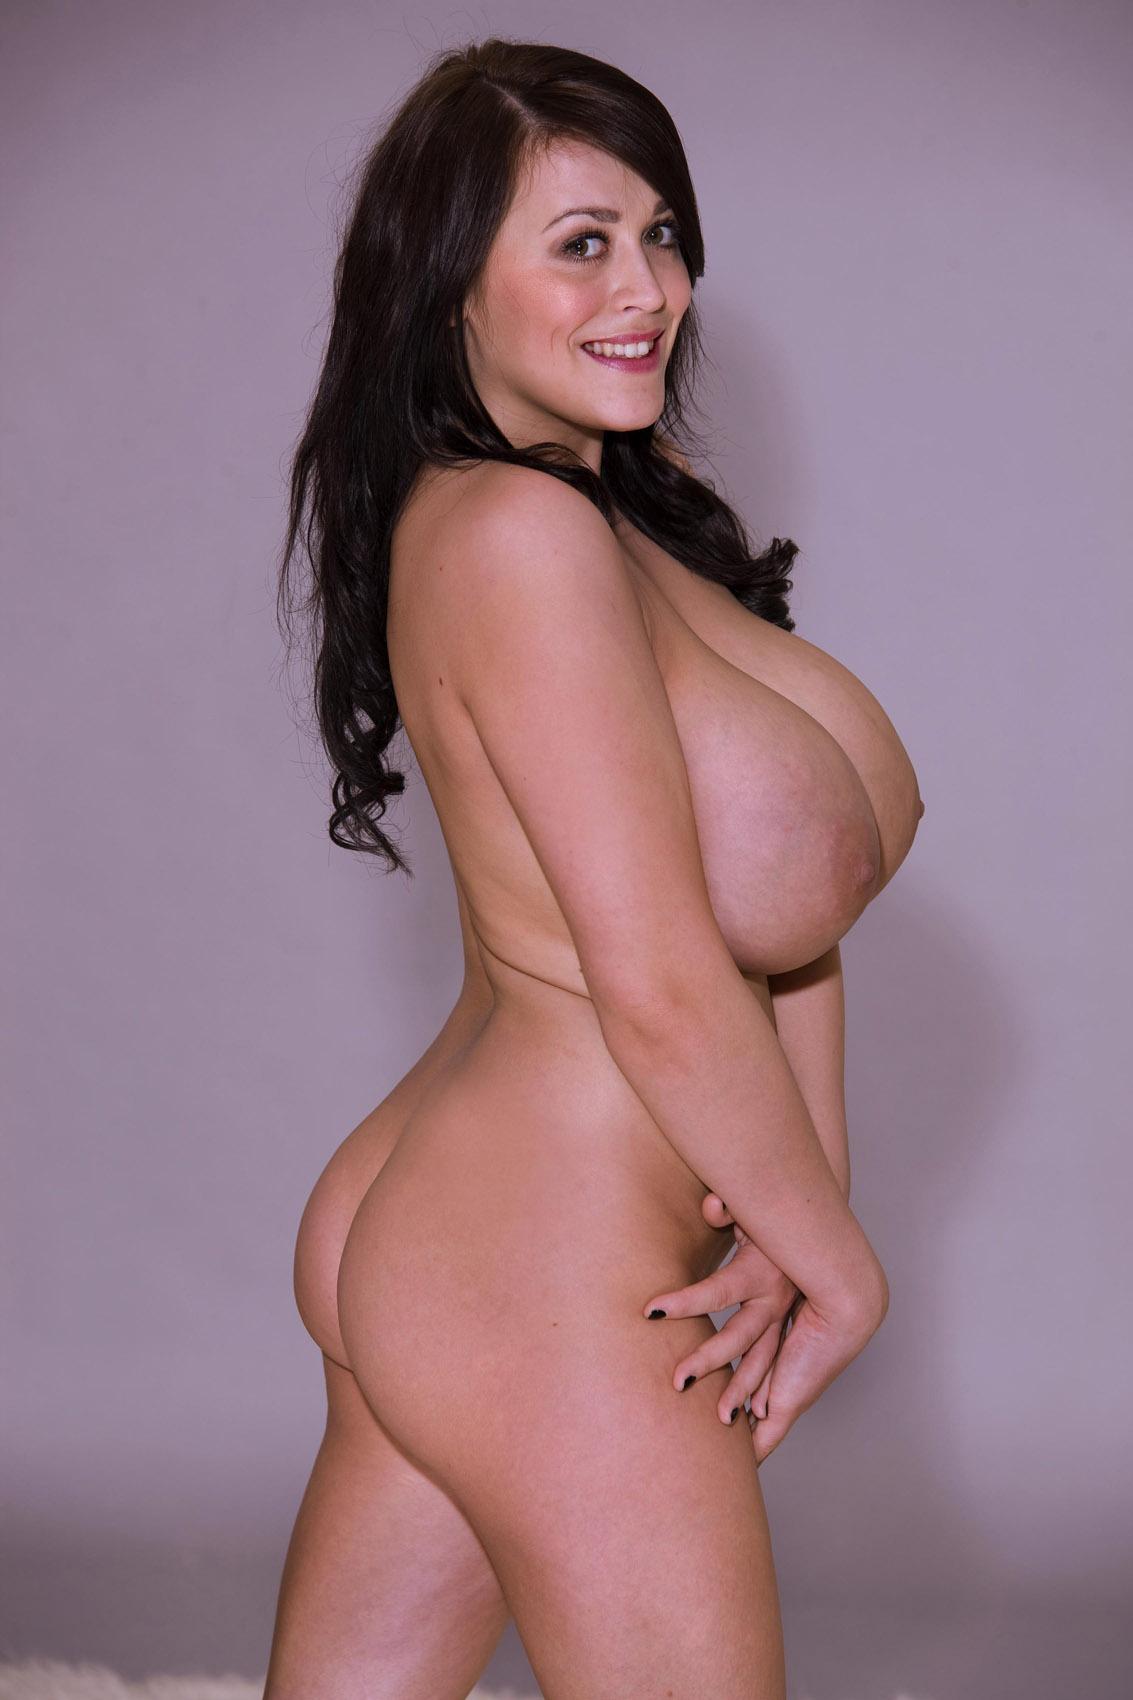 pics Leanne crow nude